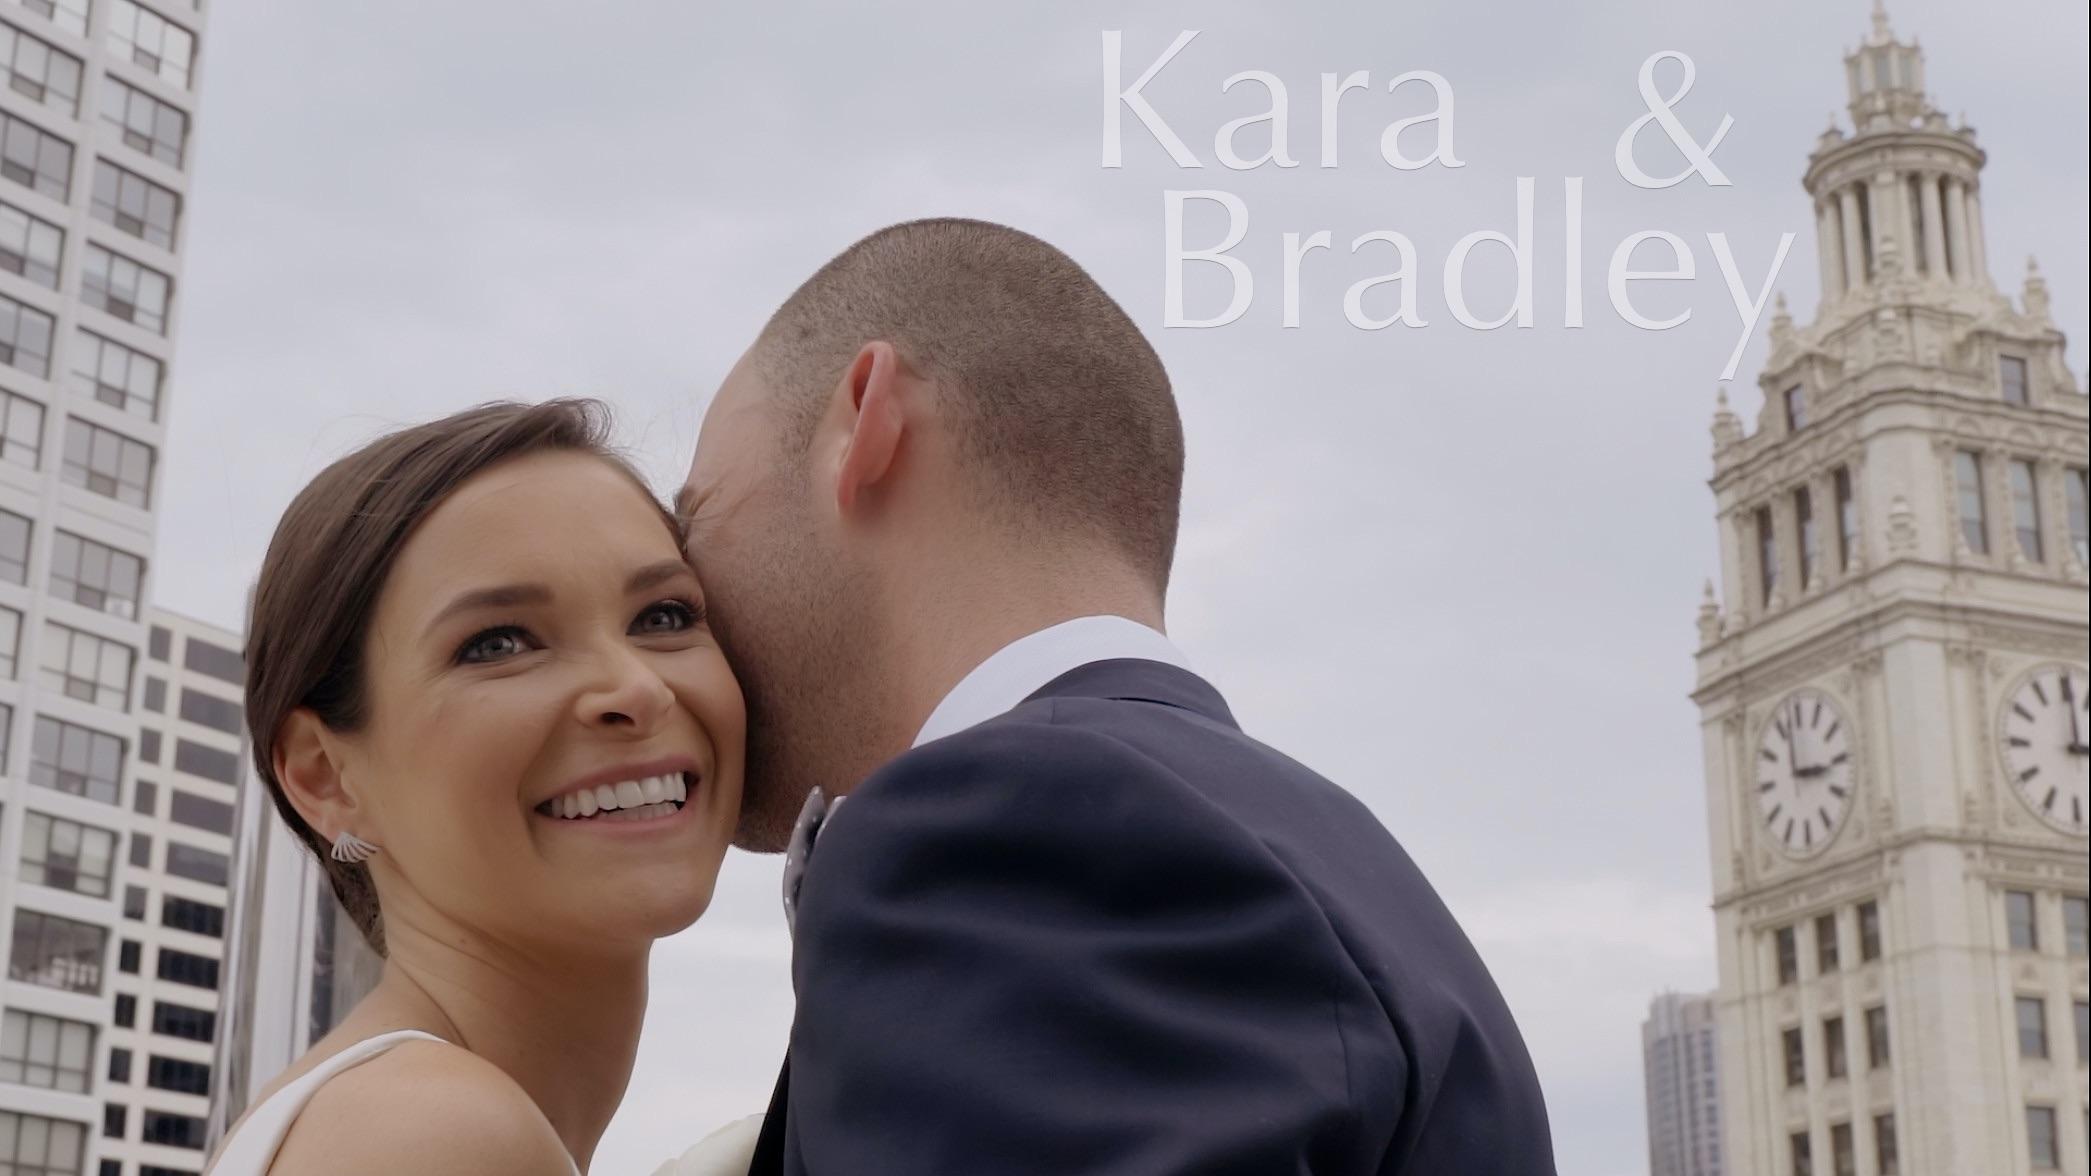 Kara + Bradley | Chicago, Illinois | RPM On the Water